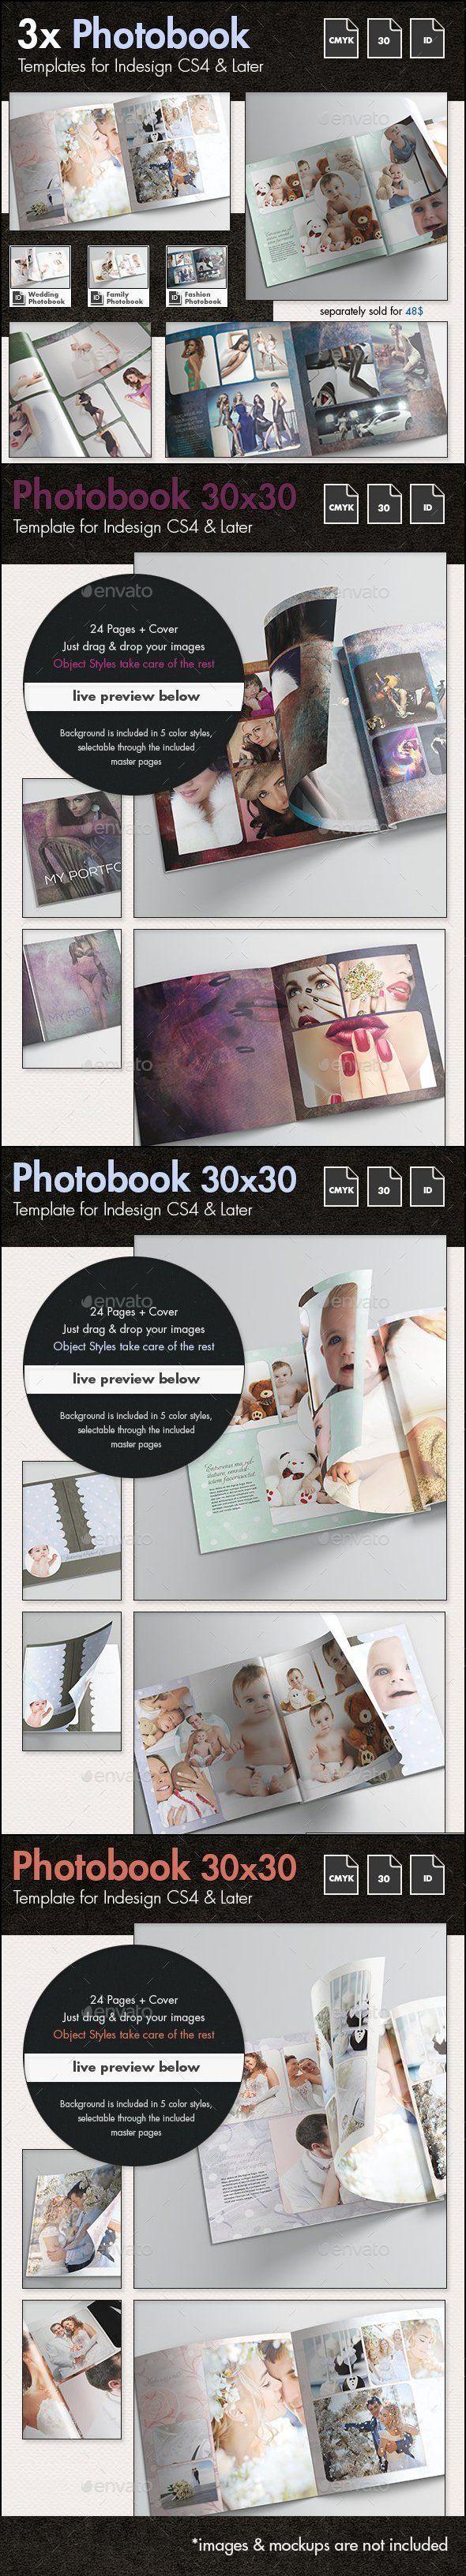 3x Photobook Album Template Bundle